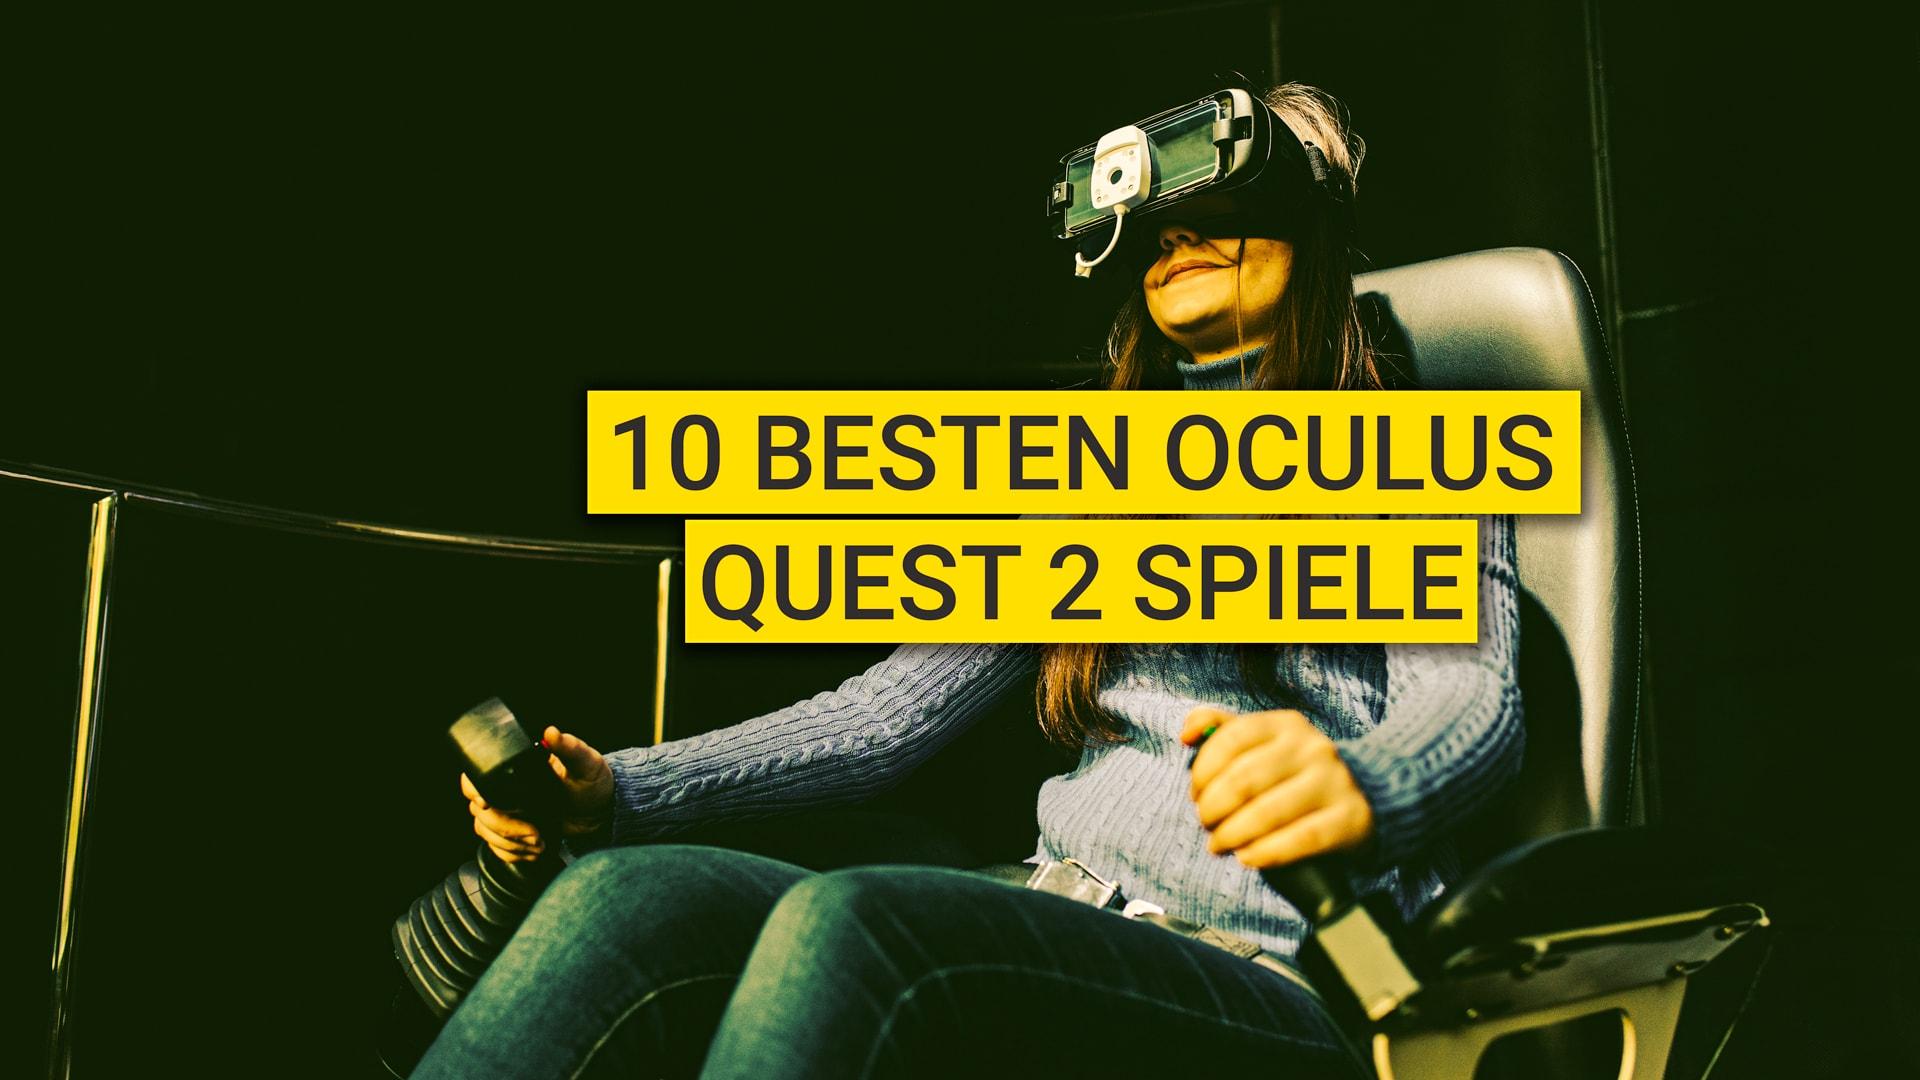 10-beste-oculus-quest-2-Spiele